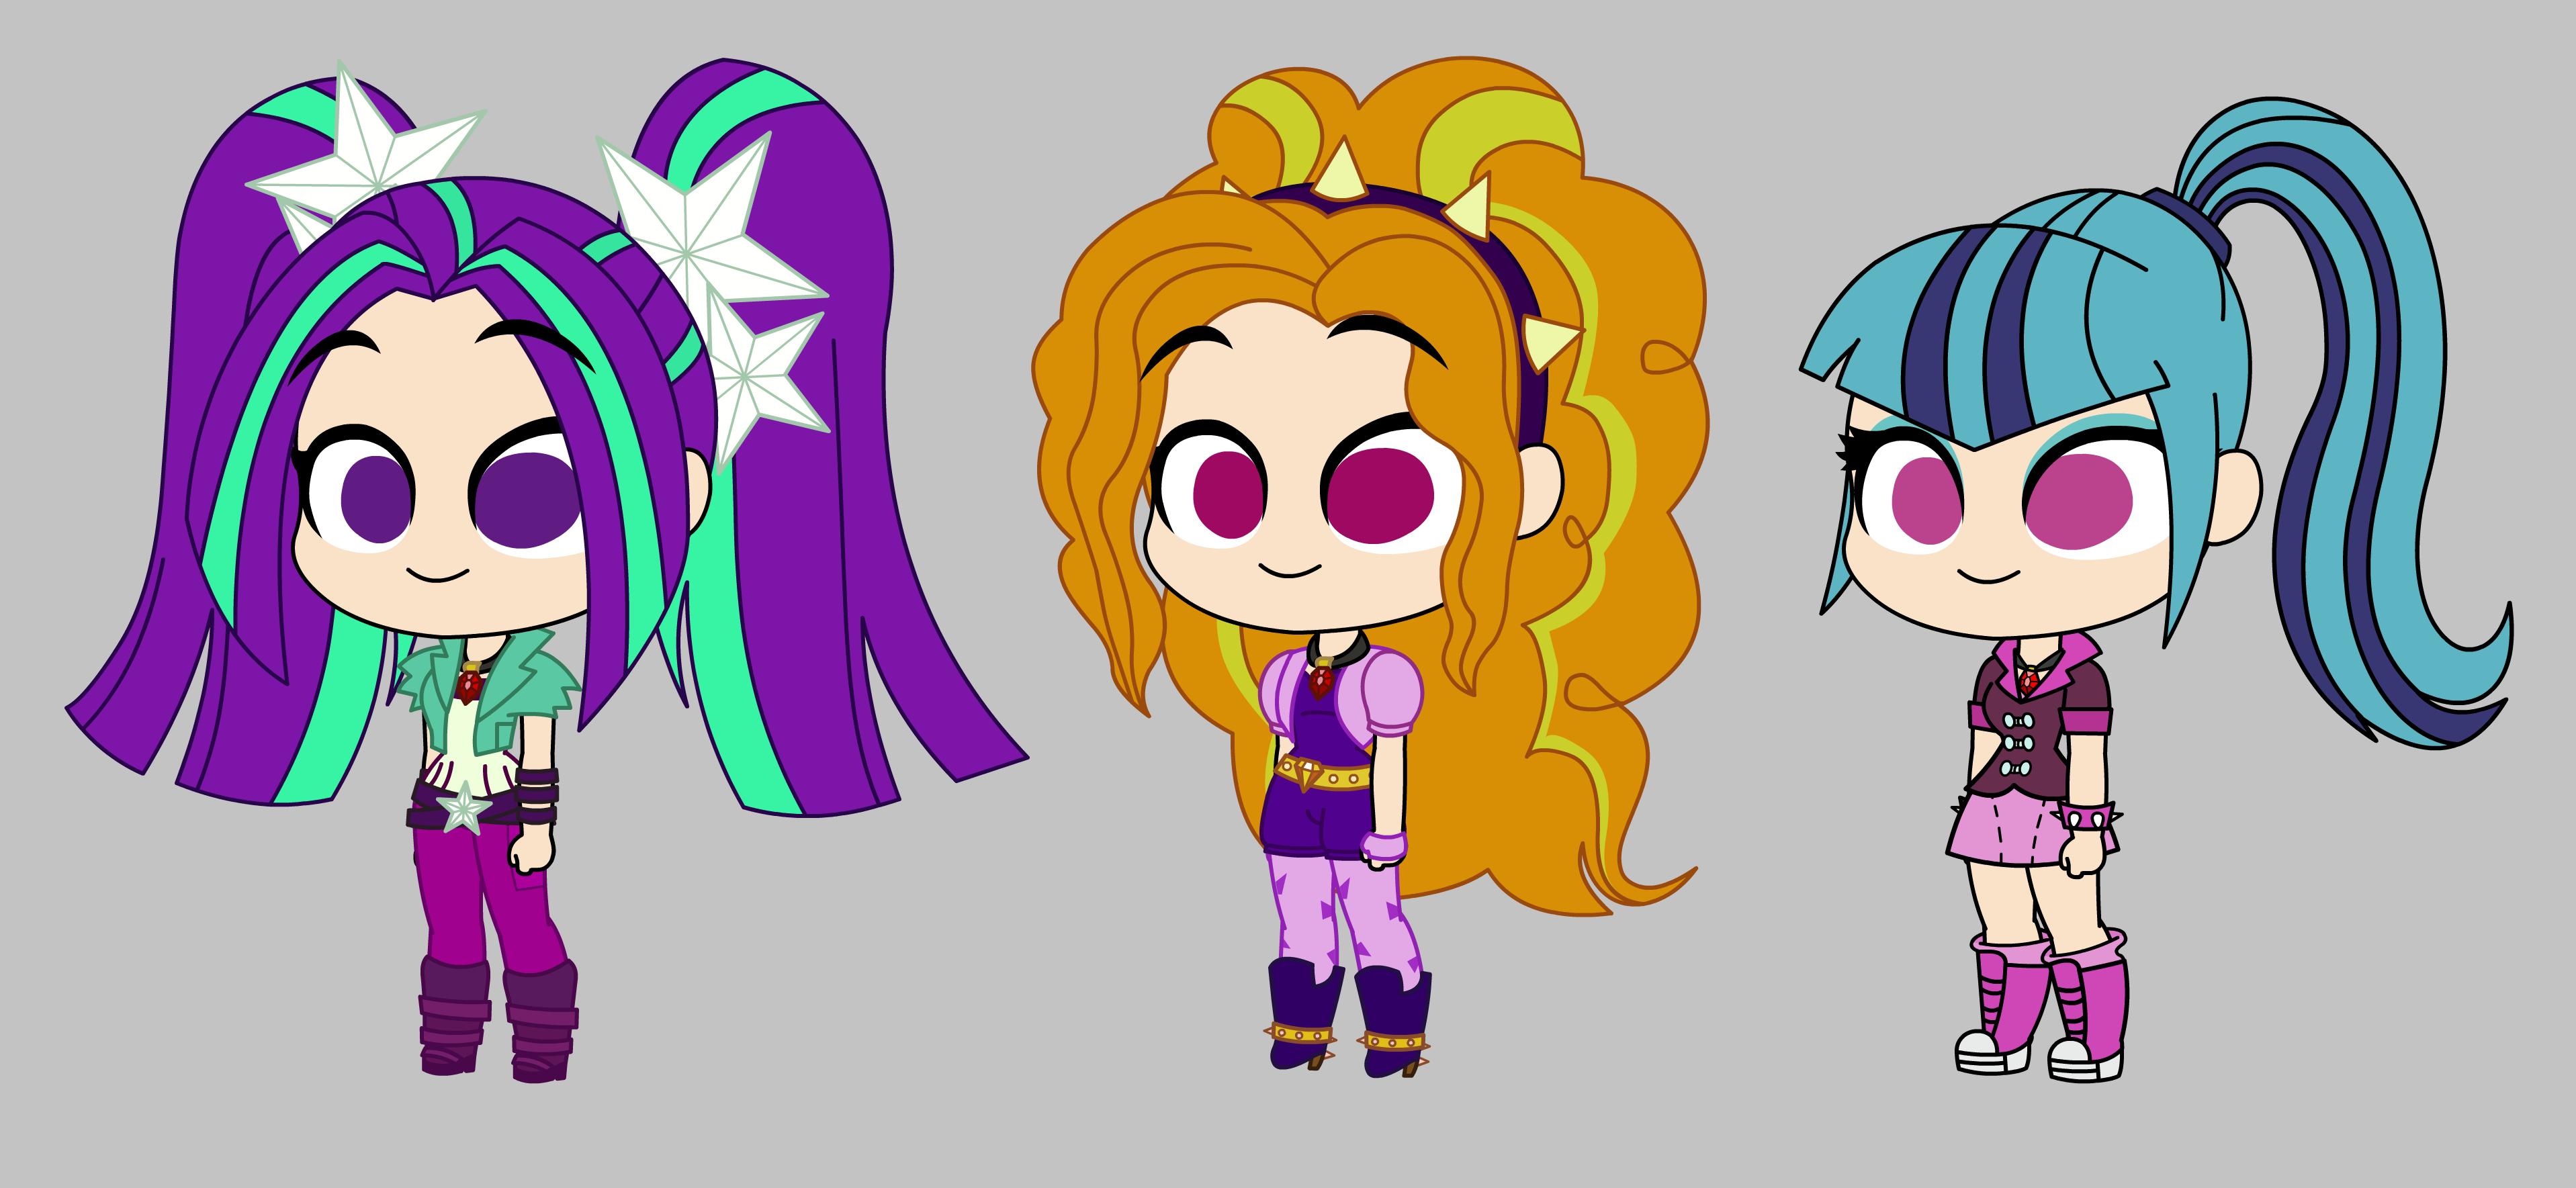 #1022739 - adagio dazzle, aria blaze, artist:kanduli, cute, equestria girls, safe, sonata dusk, the dazzlings - Derpibooru - My Little Pony: Friendship is Magic Imageboard